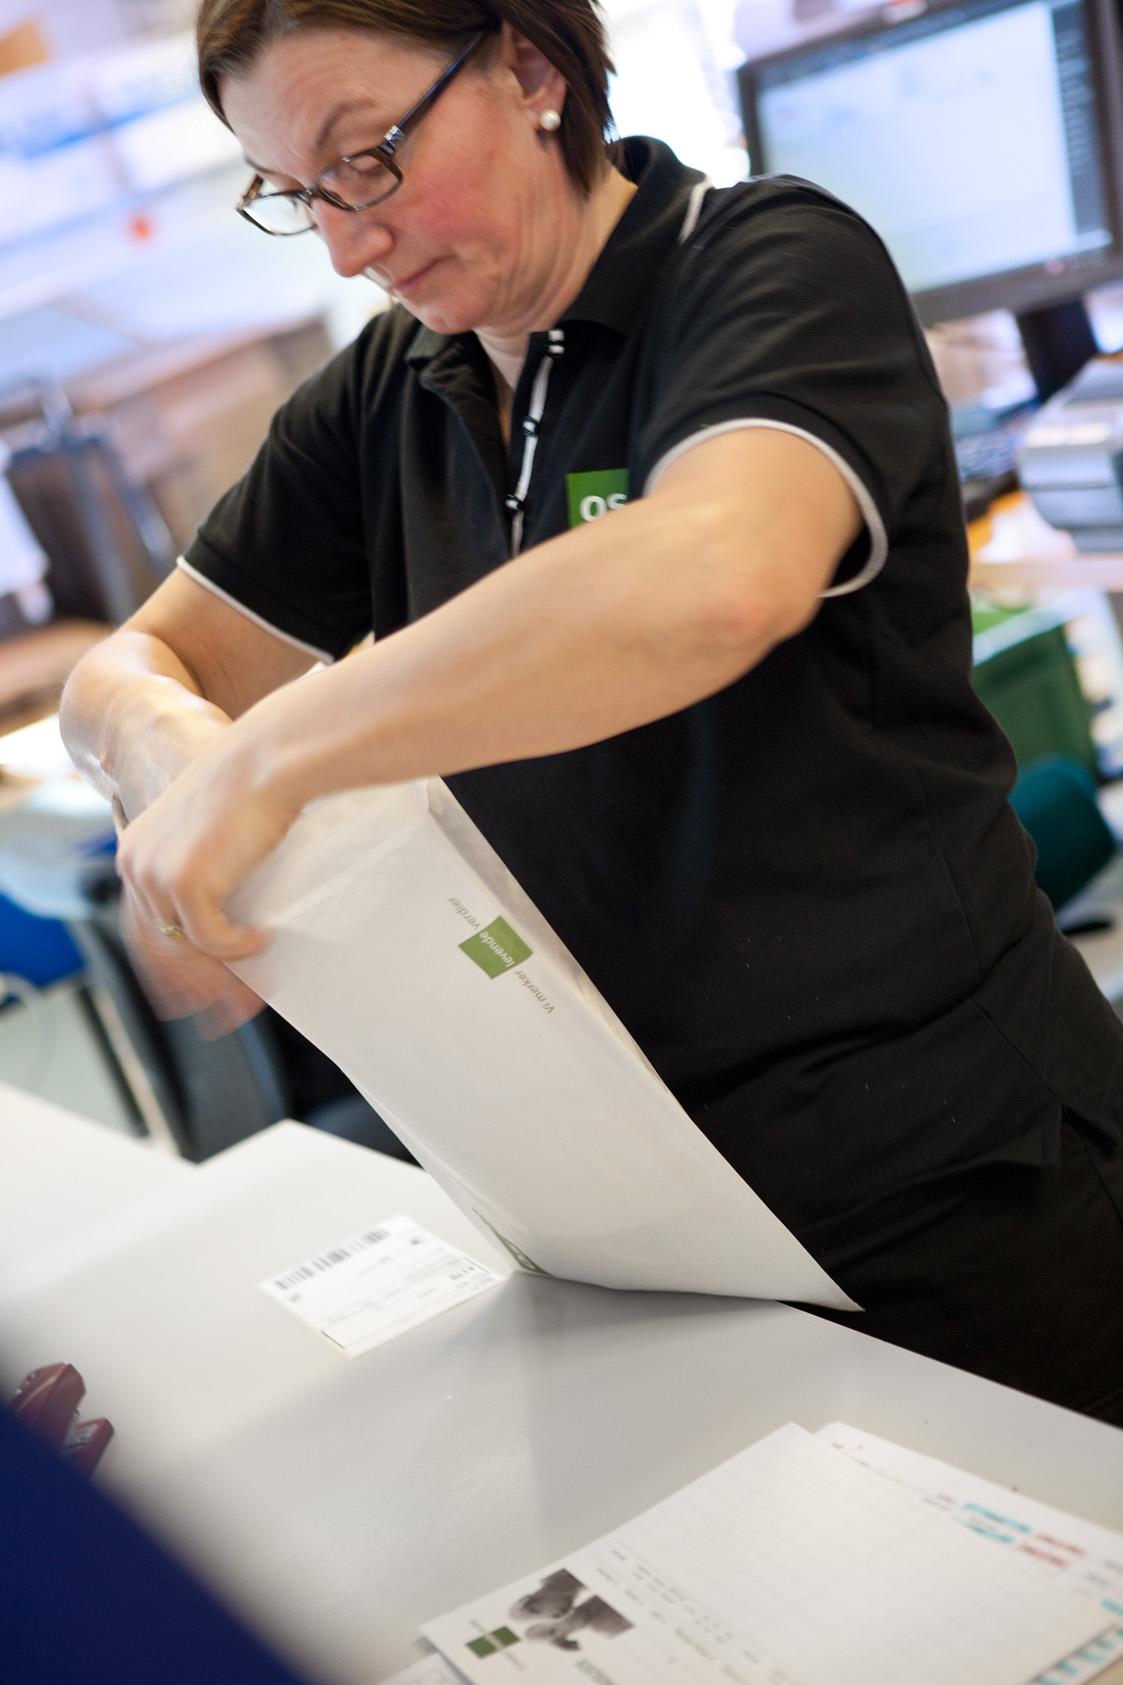 Foto: OS ID-medarbeider pakker varer